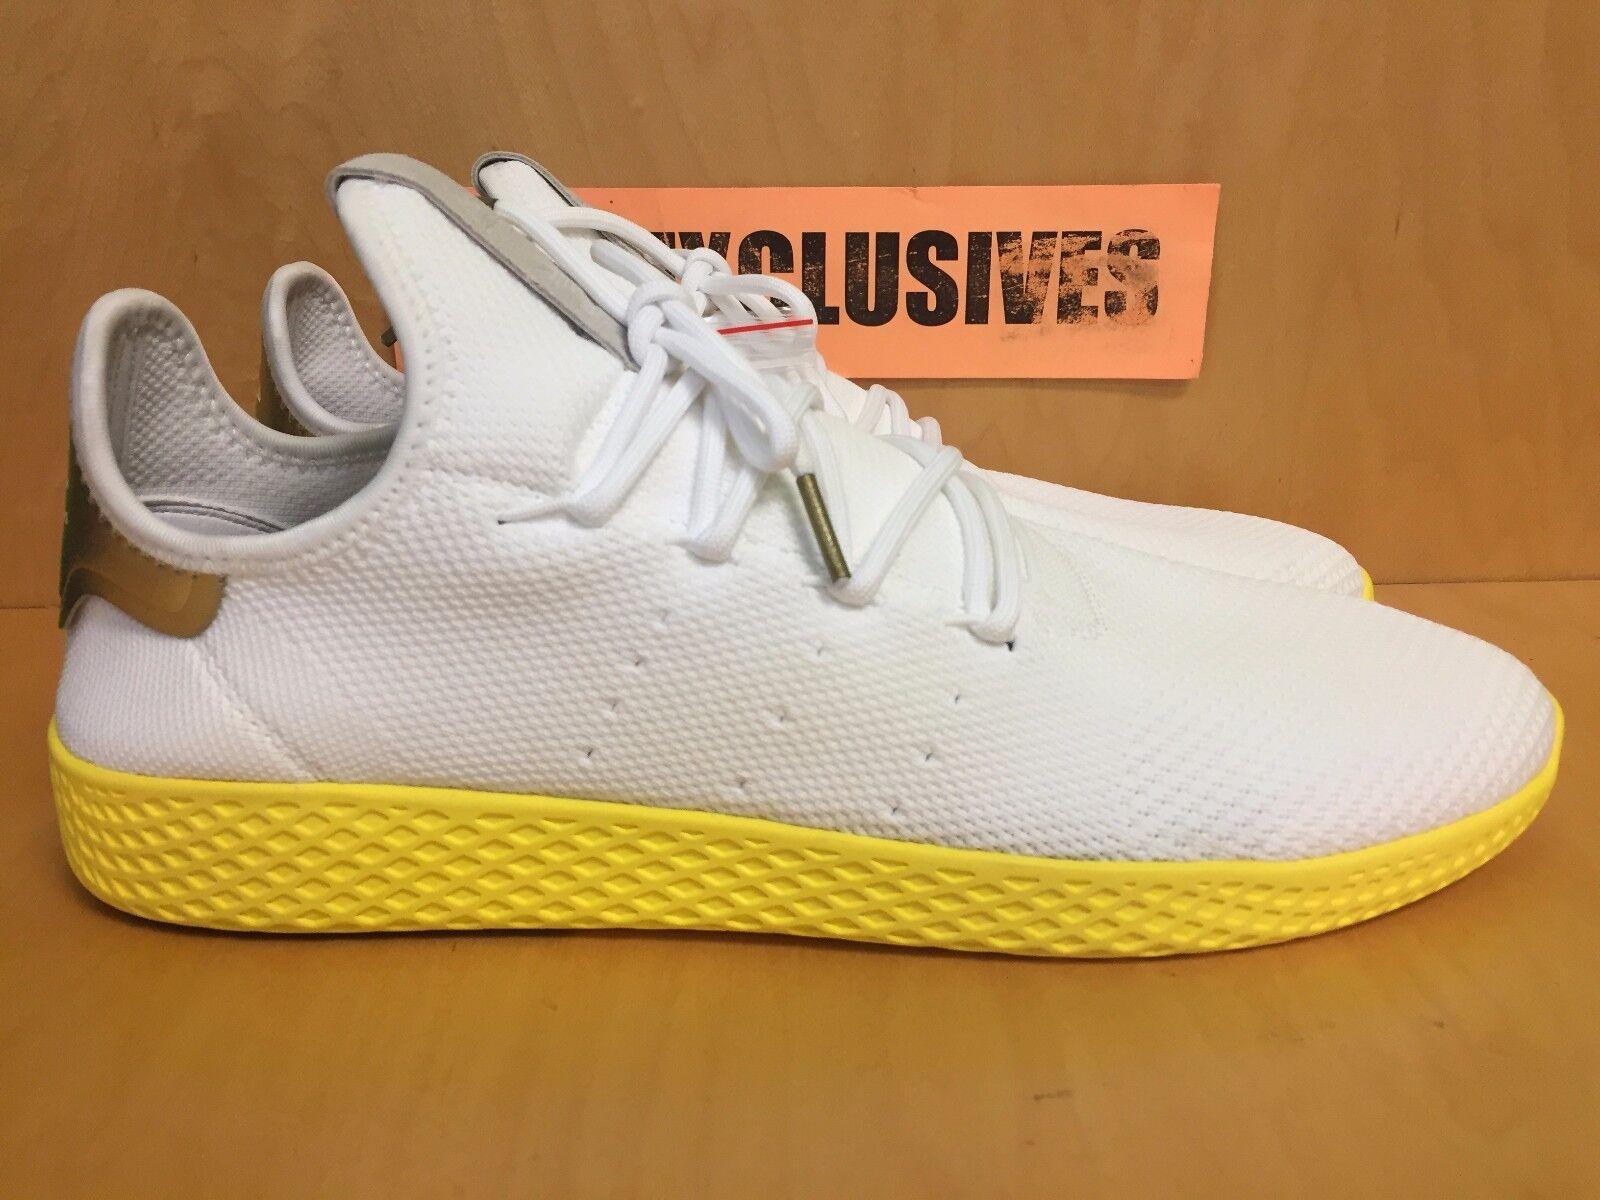 Adidas White Pharrell Williams Tennis HU White Adidas Yellow PW Human Race BY2674 SZ 8-13 6dc378